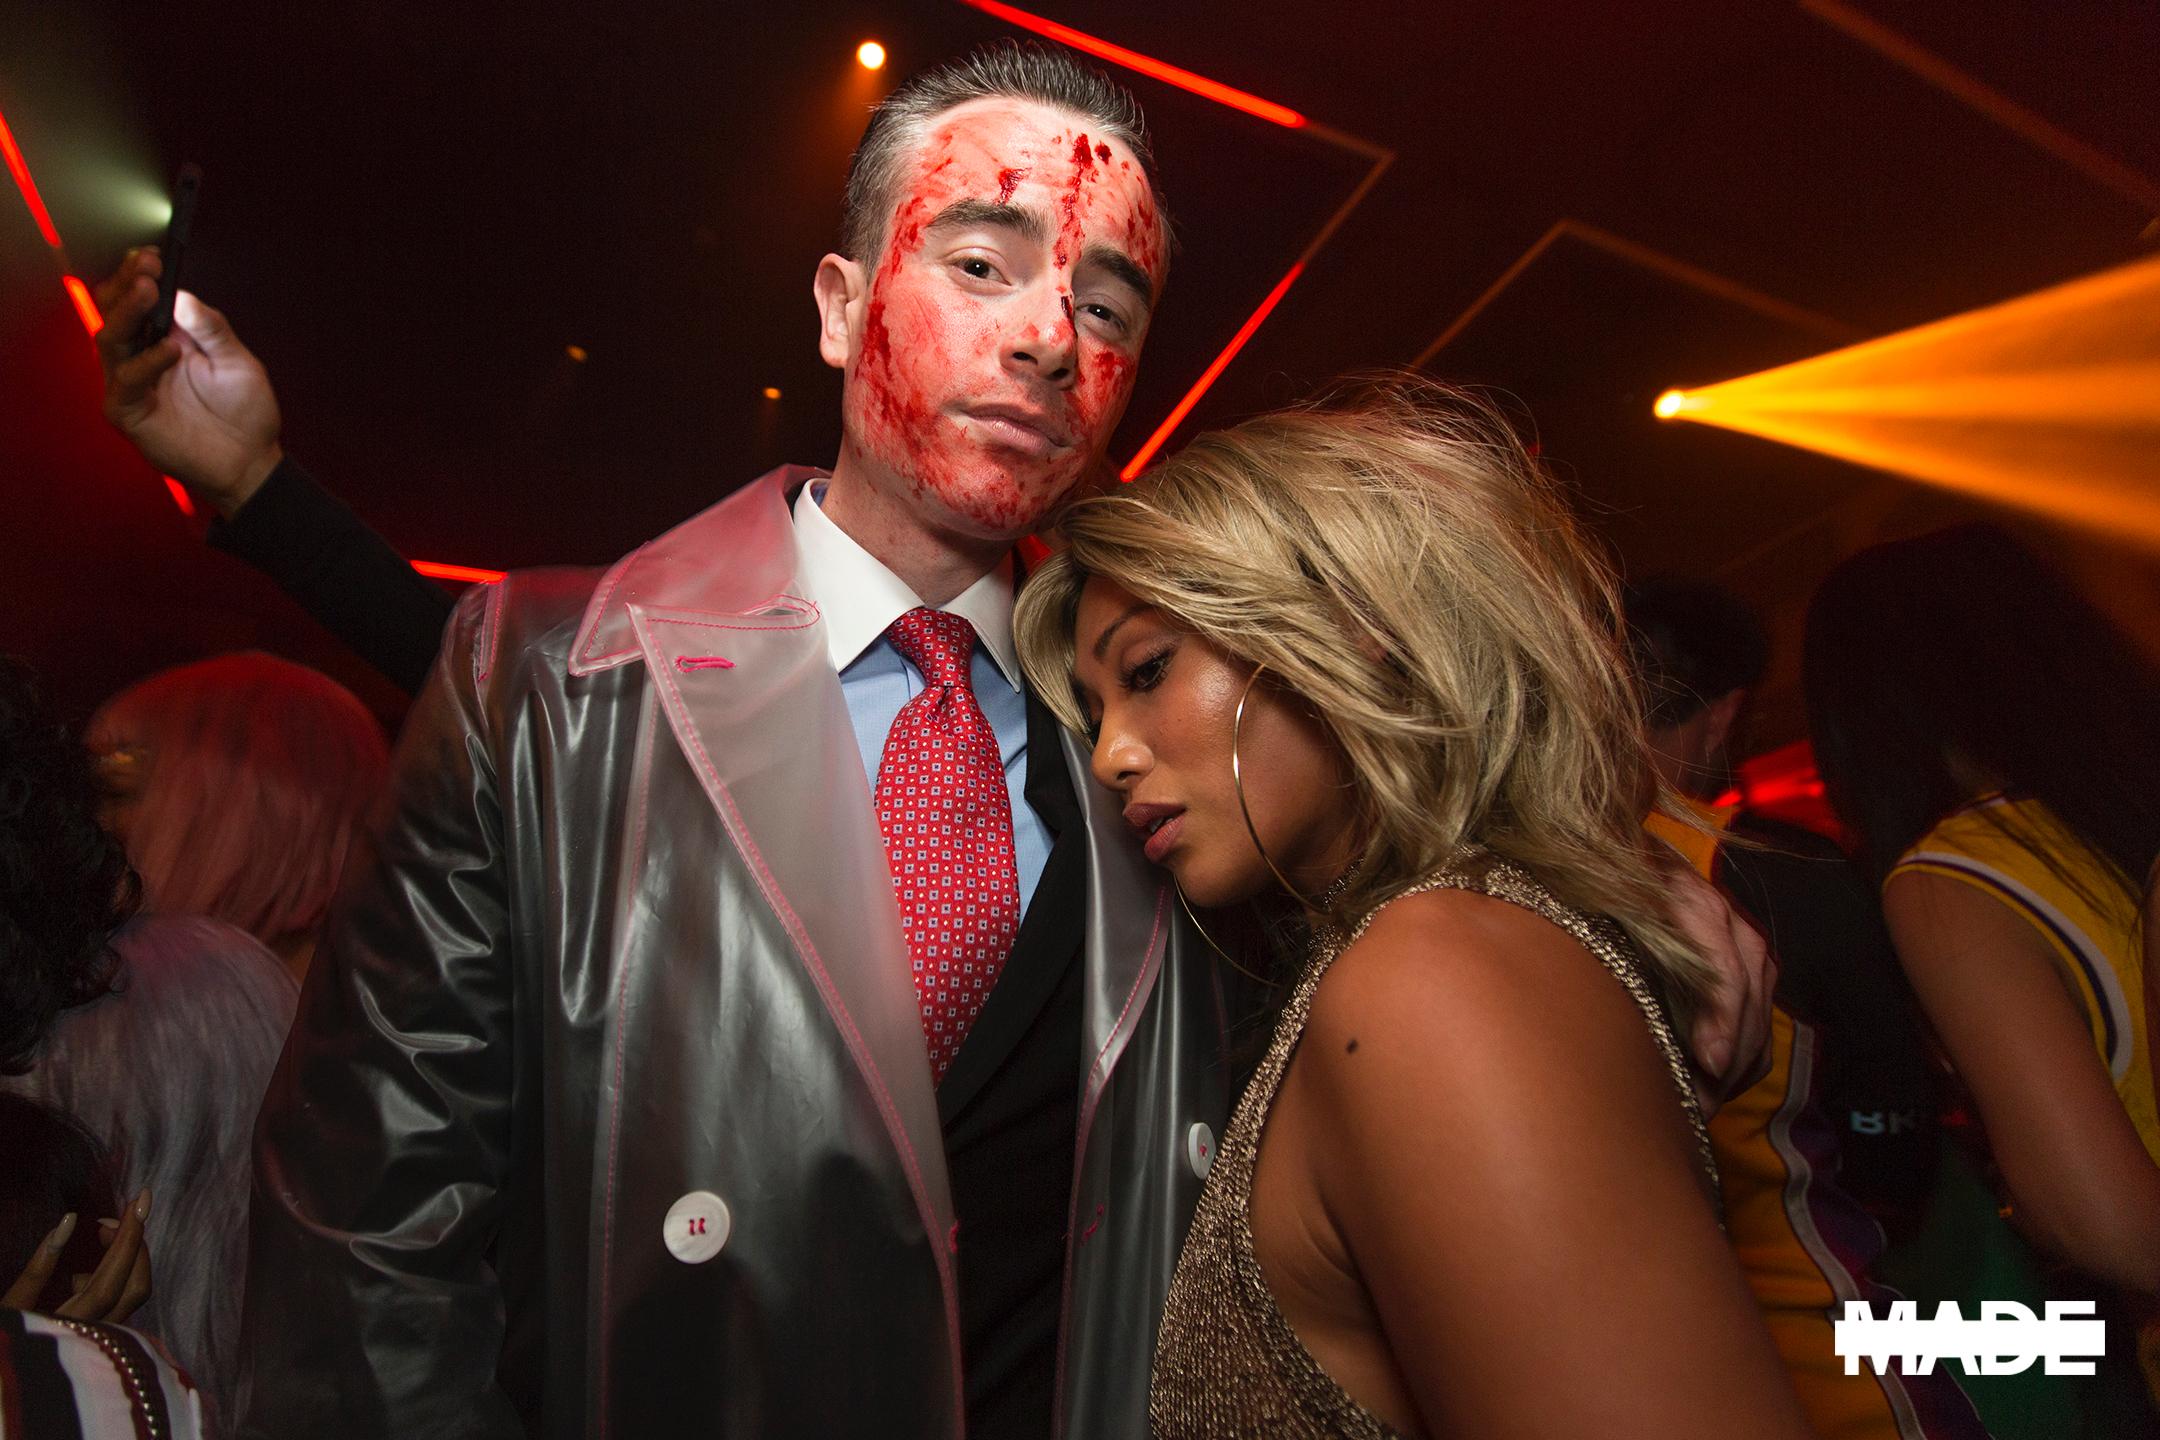 halloween at avenue nightclub (6).jpg